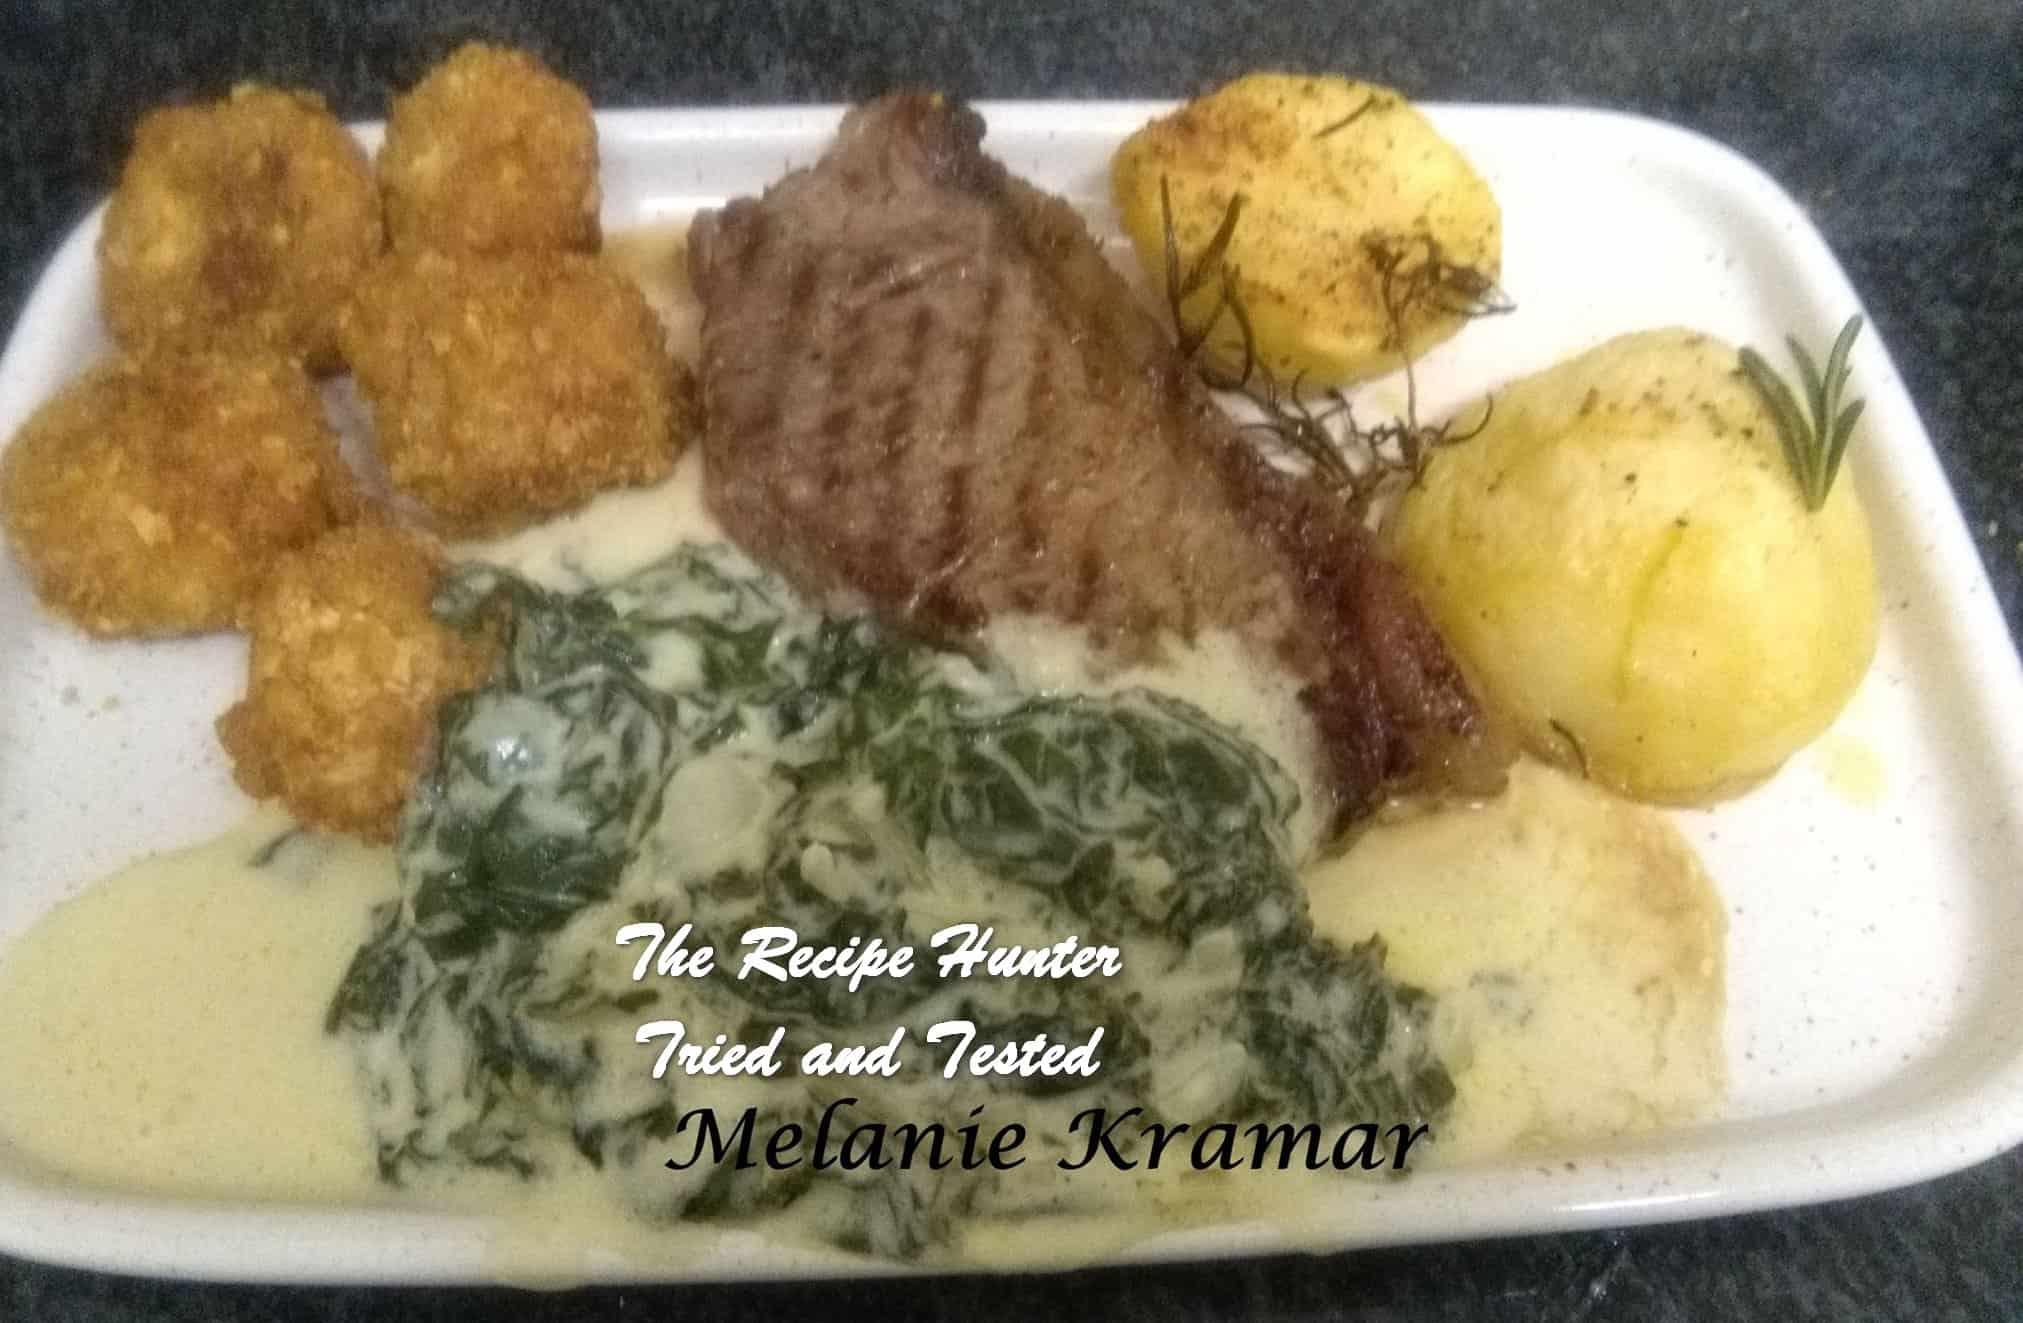 Melanie's Grilled Porterhouse Steaks and Vegetables